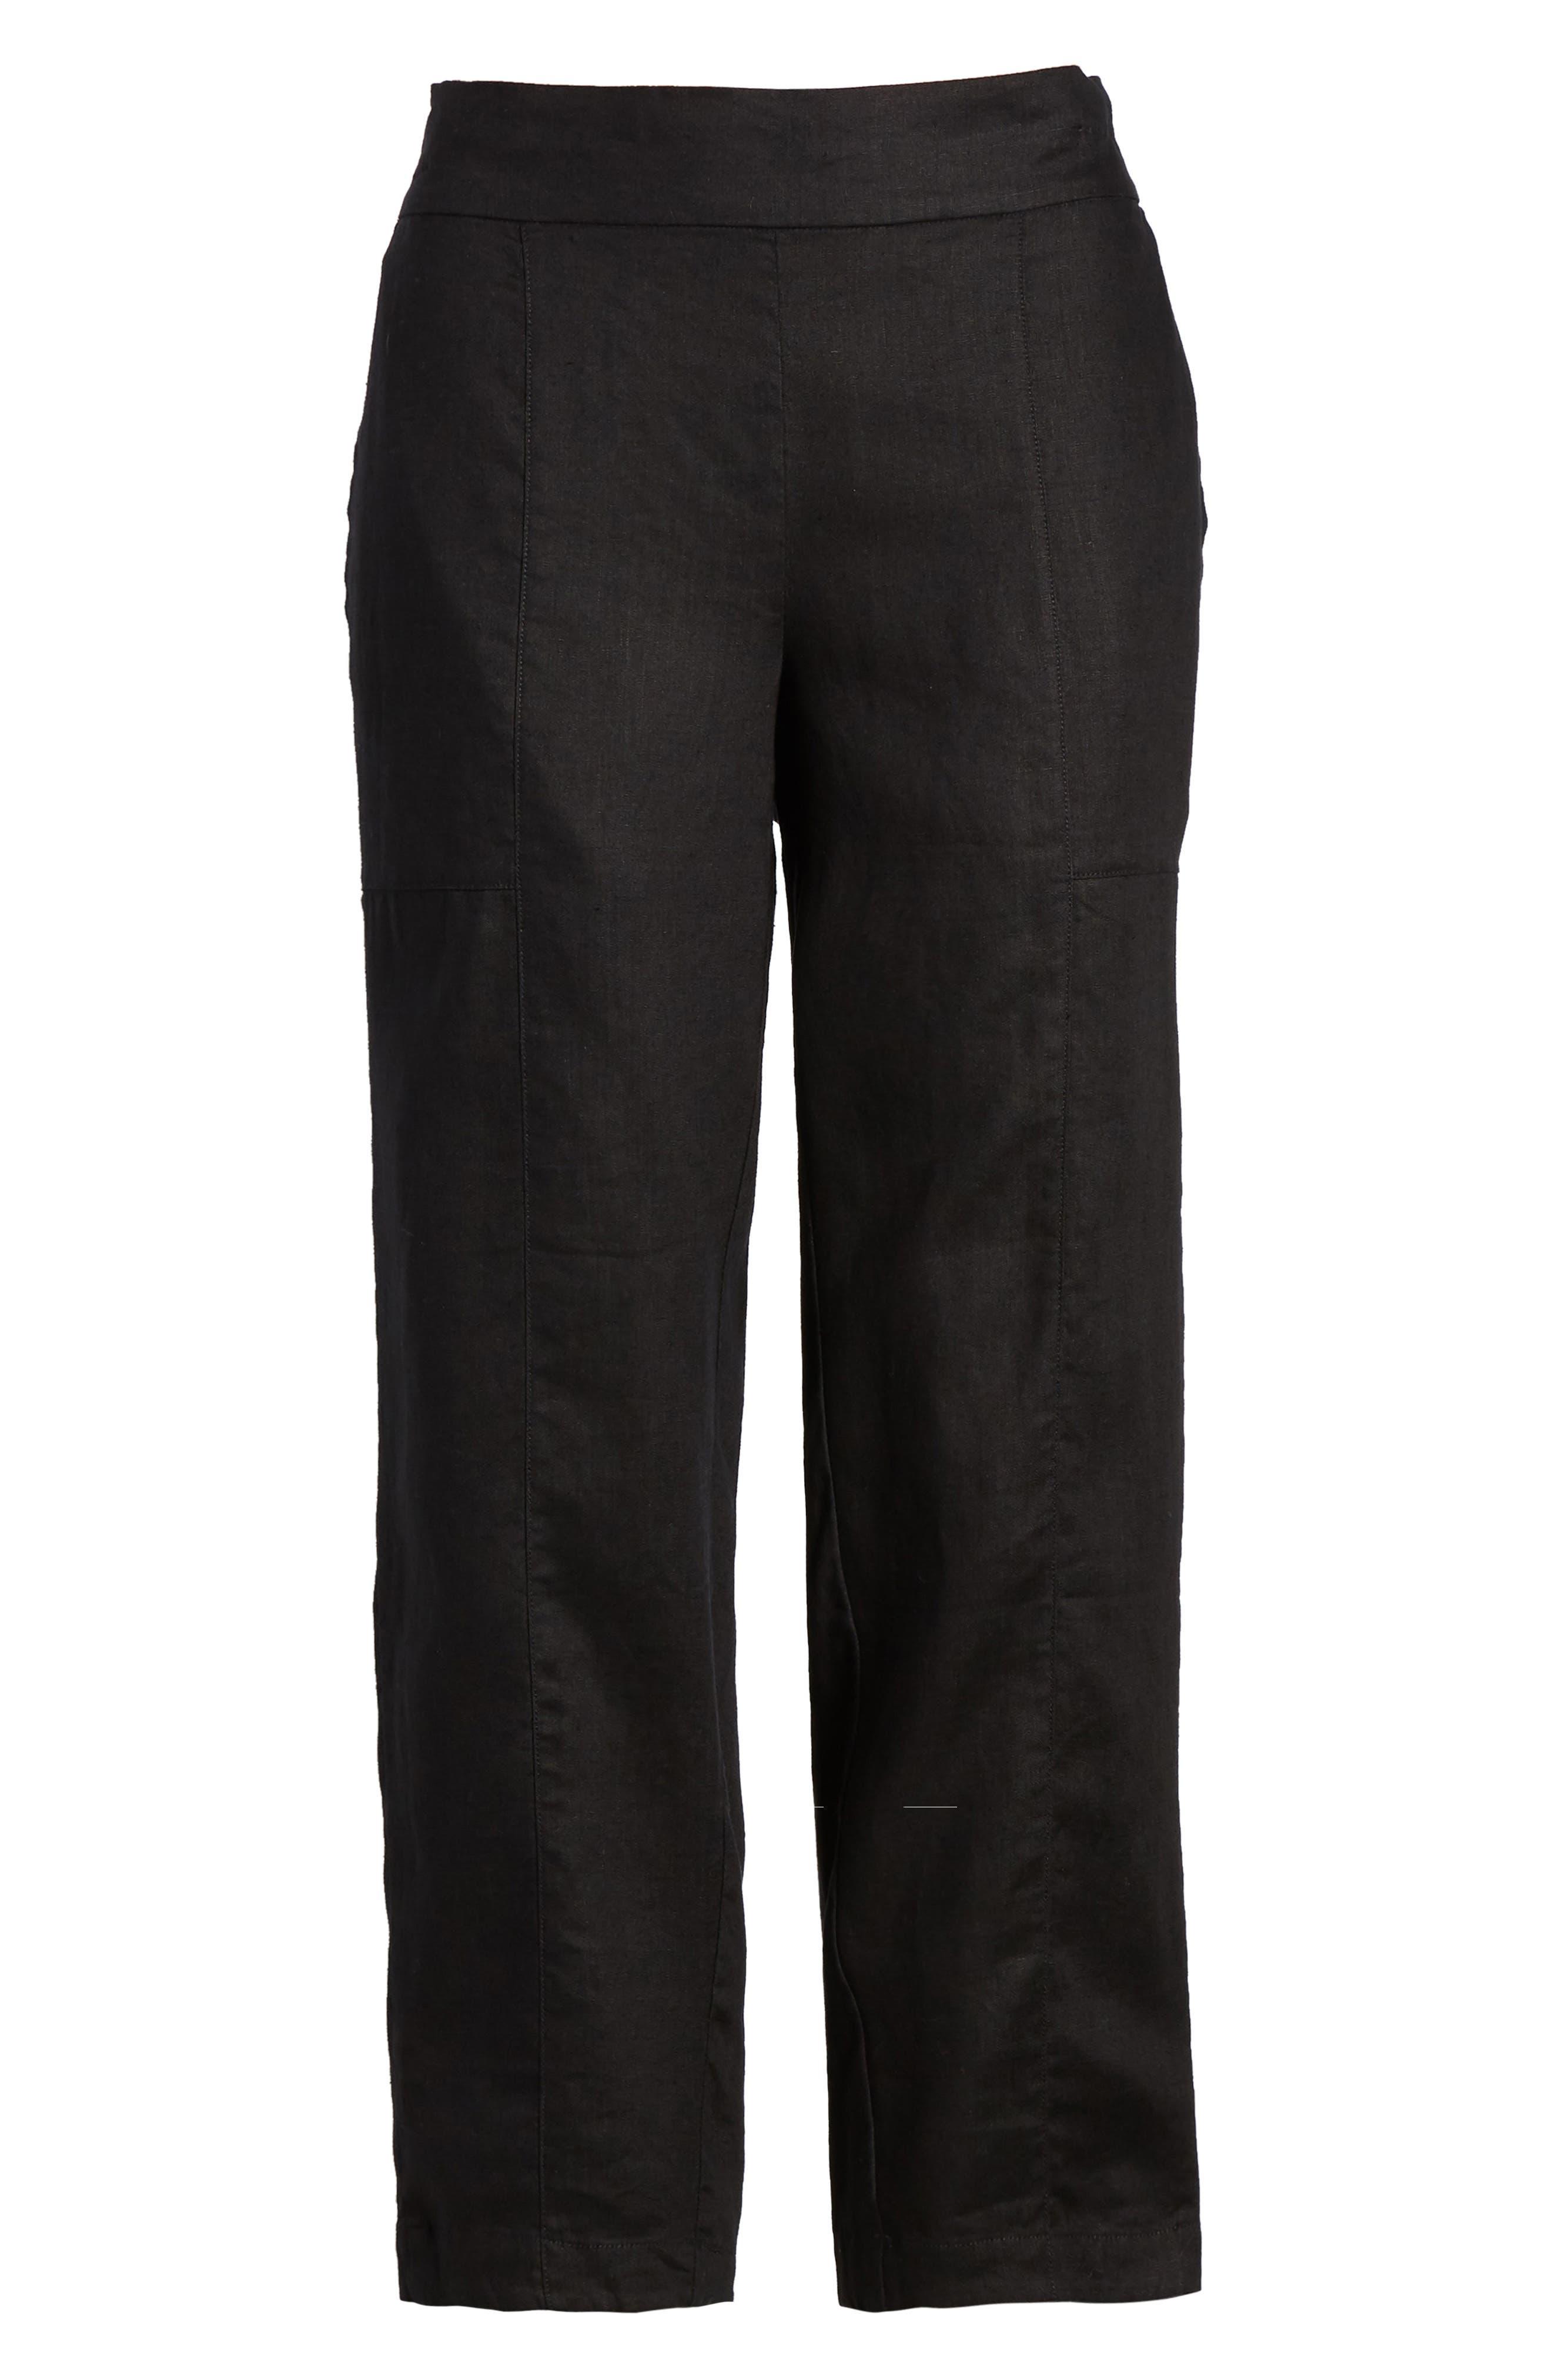 Organic Linen Crop Pants,                             Alternate thumbnail 22, color,